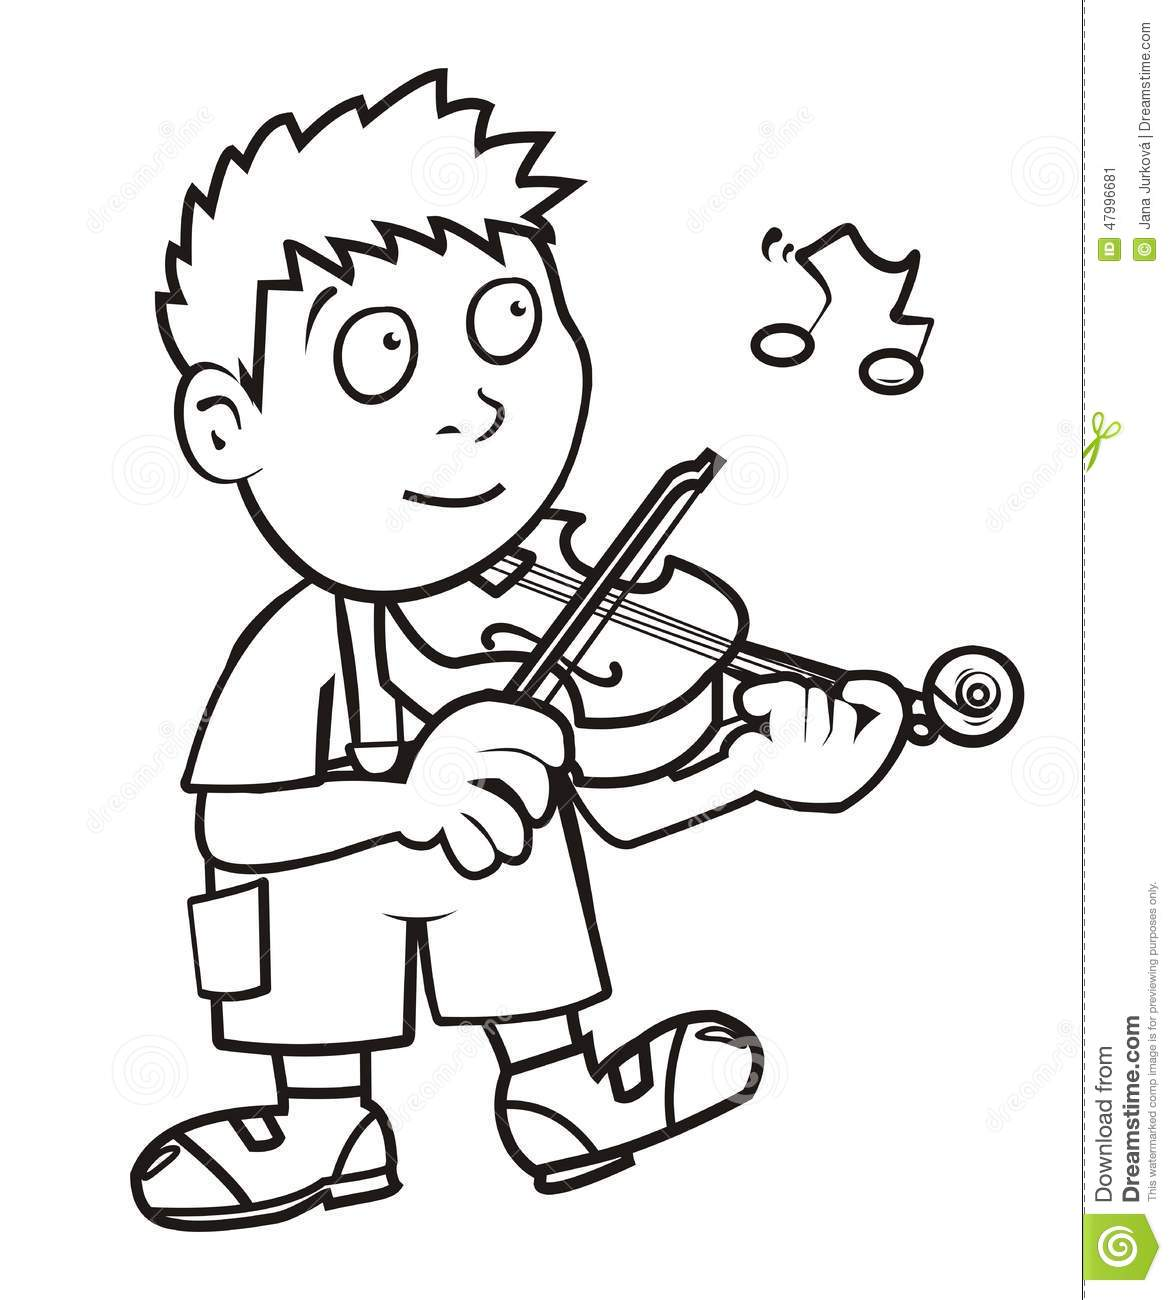 Violinist coloring #16, Download drawings